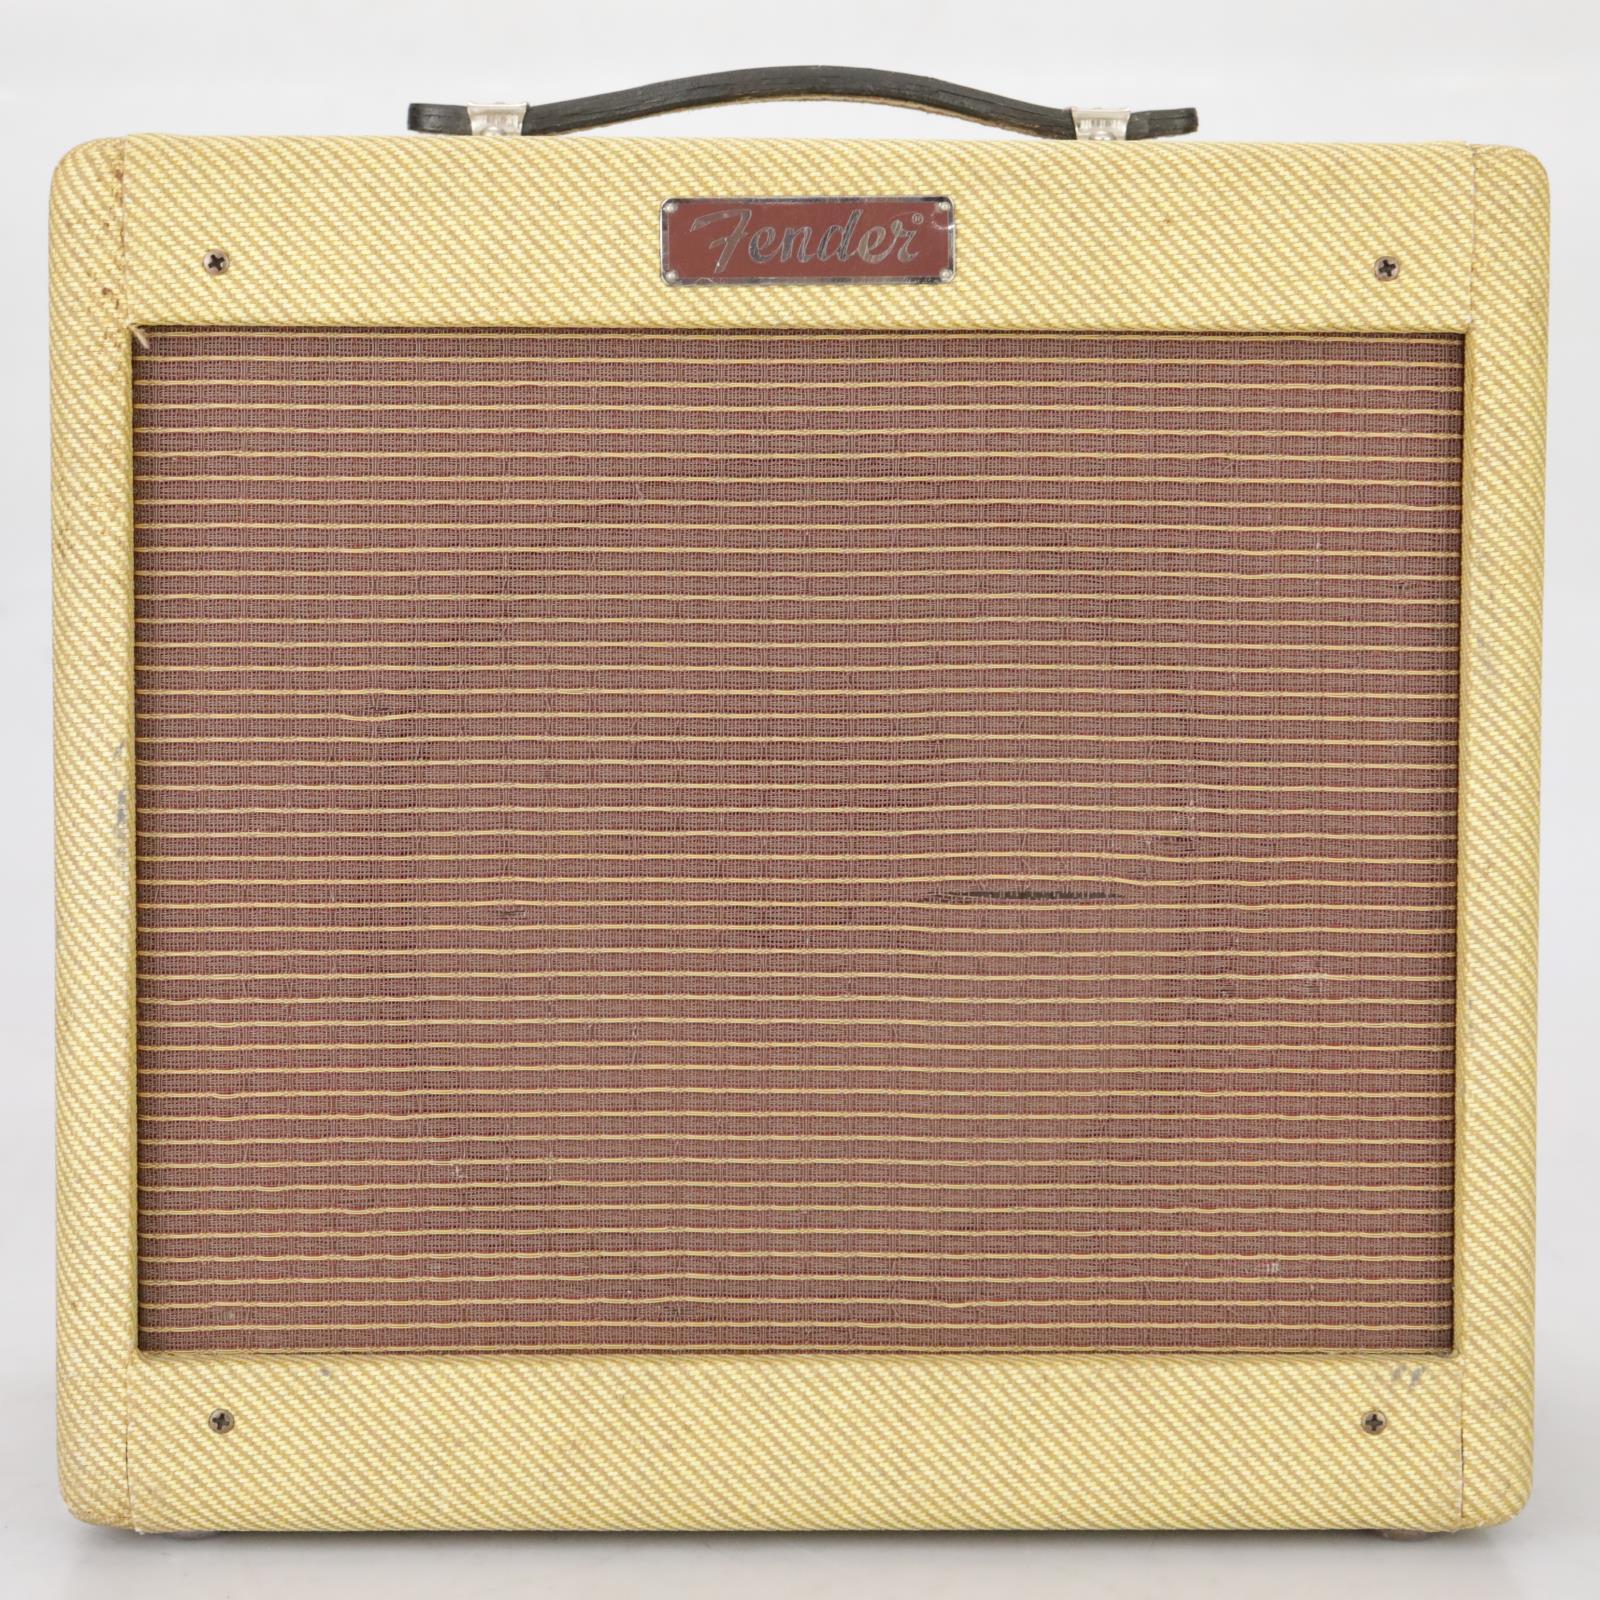 Fender Pro Junior PR 257 Tweed Combo Tube Amplifier Amp Michael Landau #37709